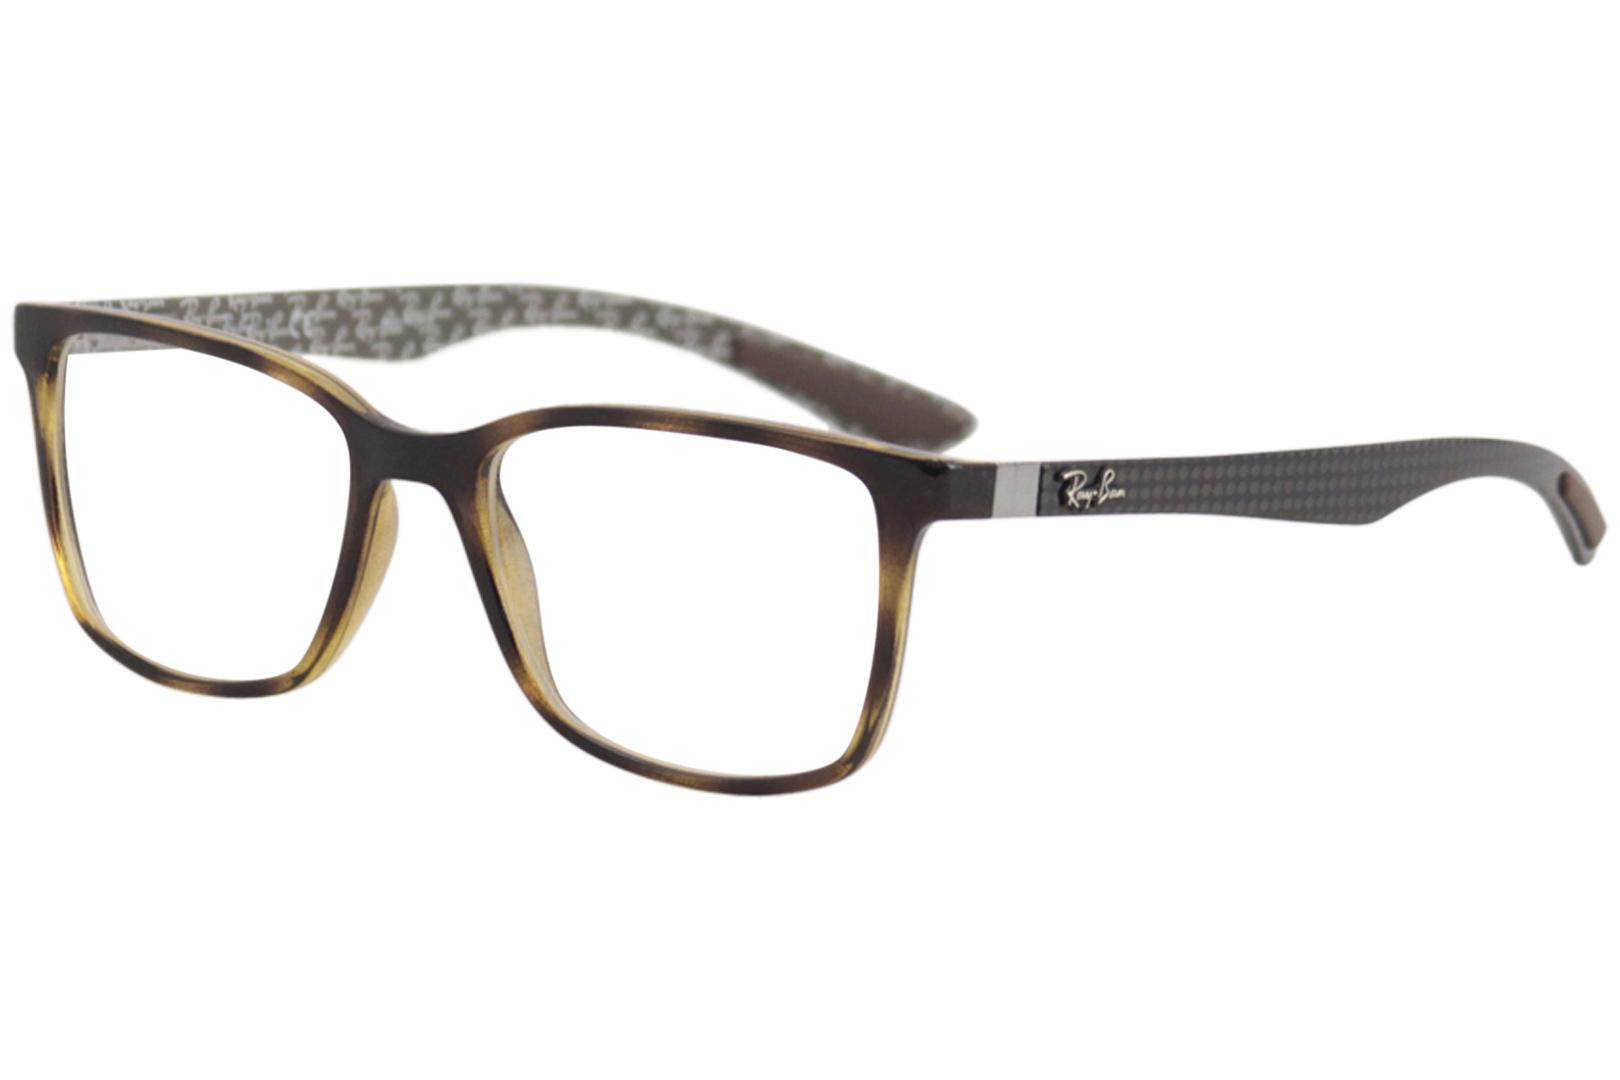 16b1ea12cc Ray Ban Men s Eyeglasses RB8905 RX 8905 5846 Havana Full Rim Optical ...